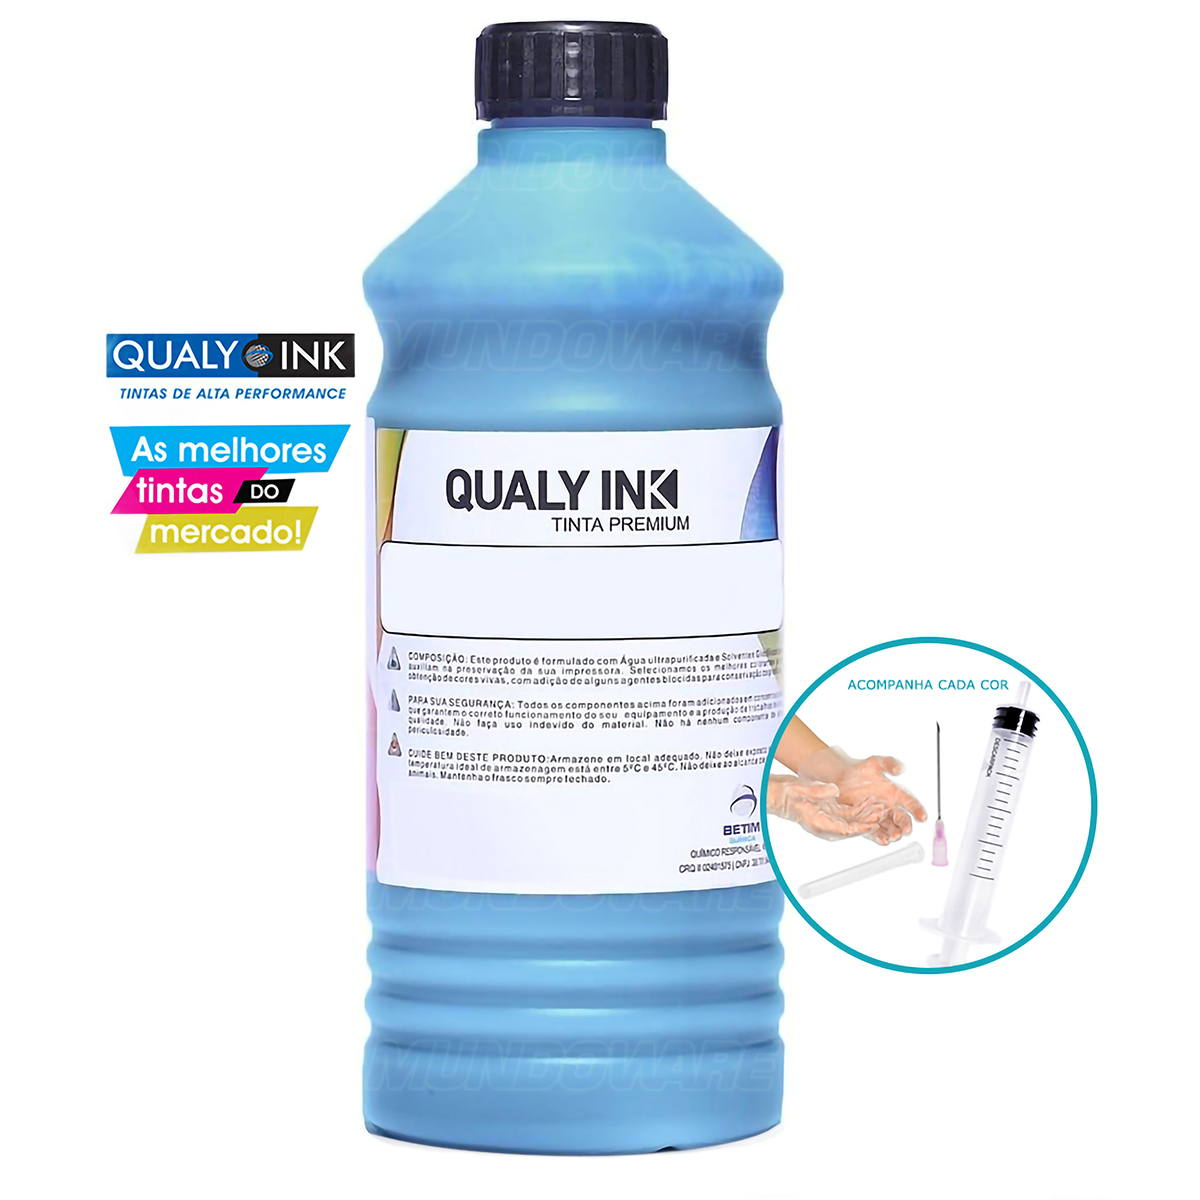 Compatível: Tinta Pigmentada Qualy-Ink CP3E-1533 Série 673 para Epson L800 L805 L810 L850 L1800 Ciano 1L